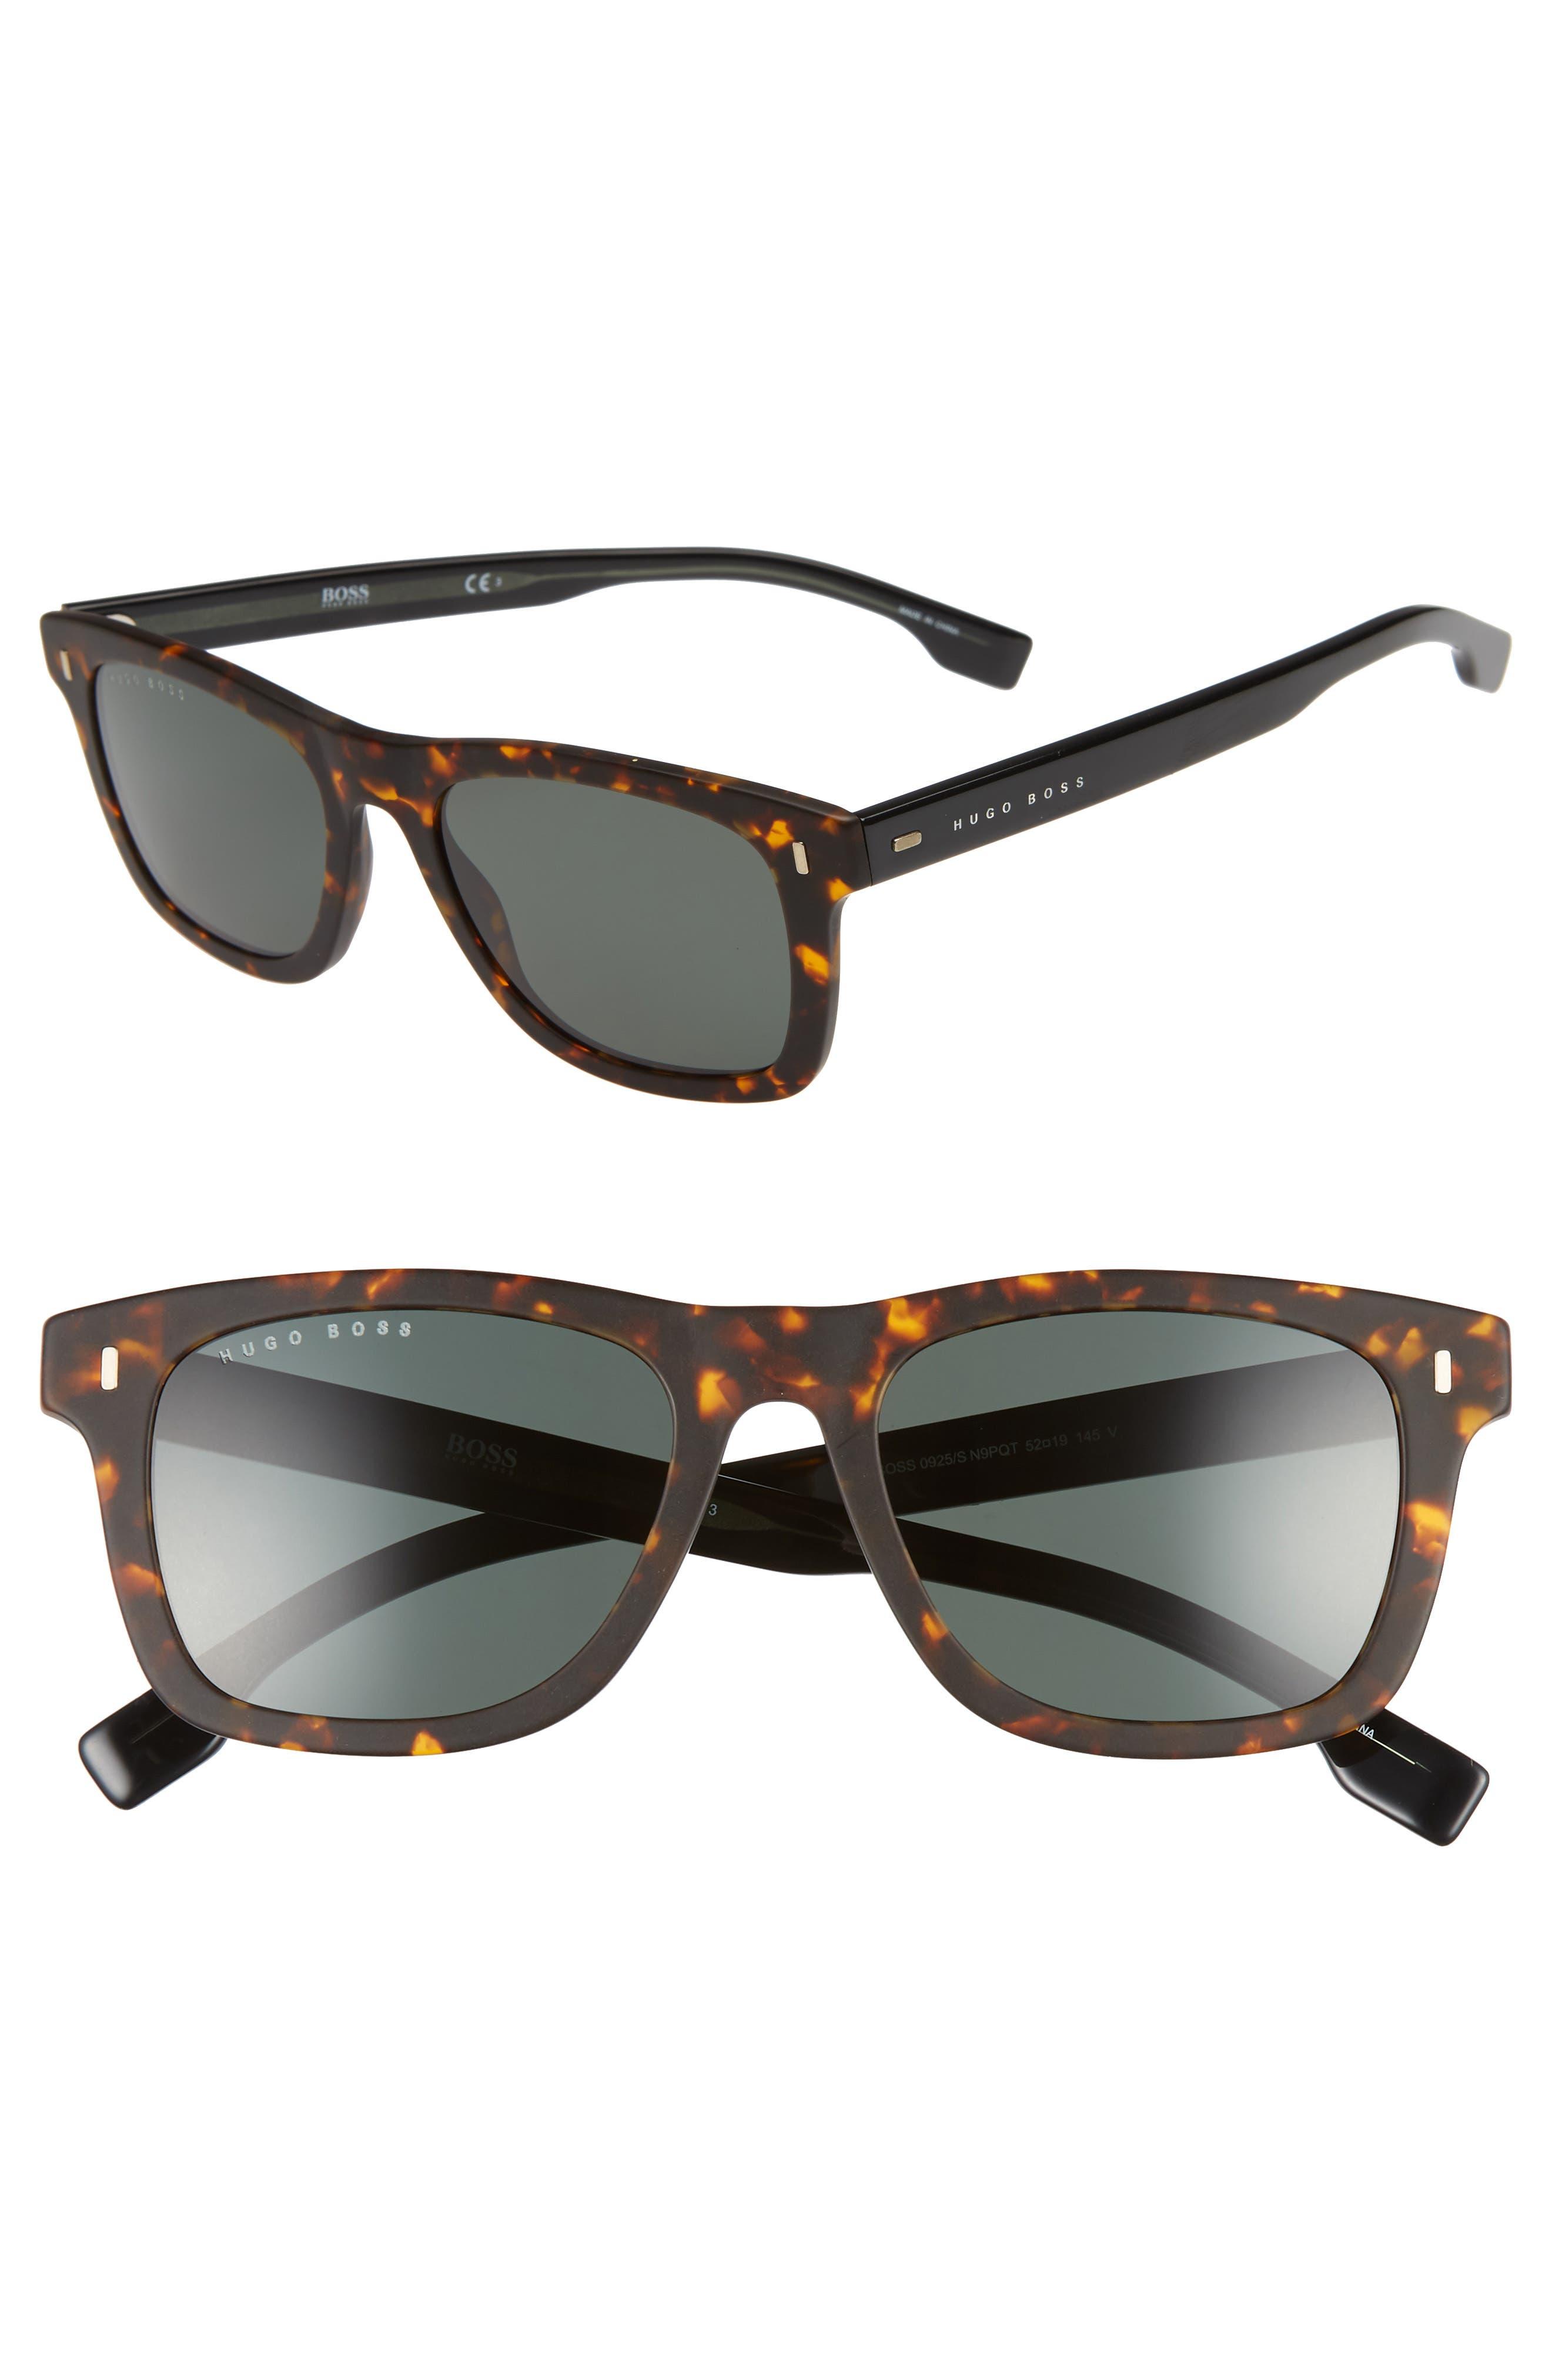 52mm Sunglasses,                             Main thumbnail 1, color,                             MATTE HAVANA